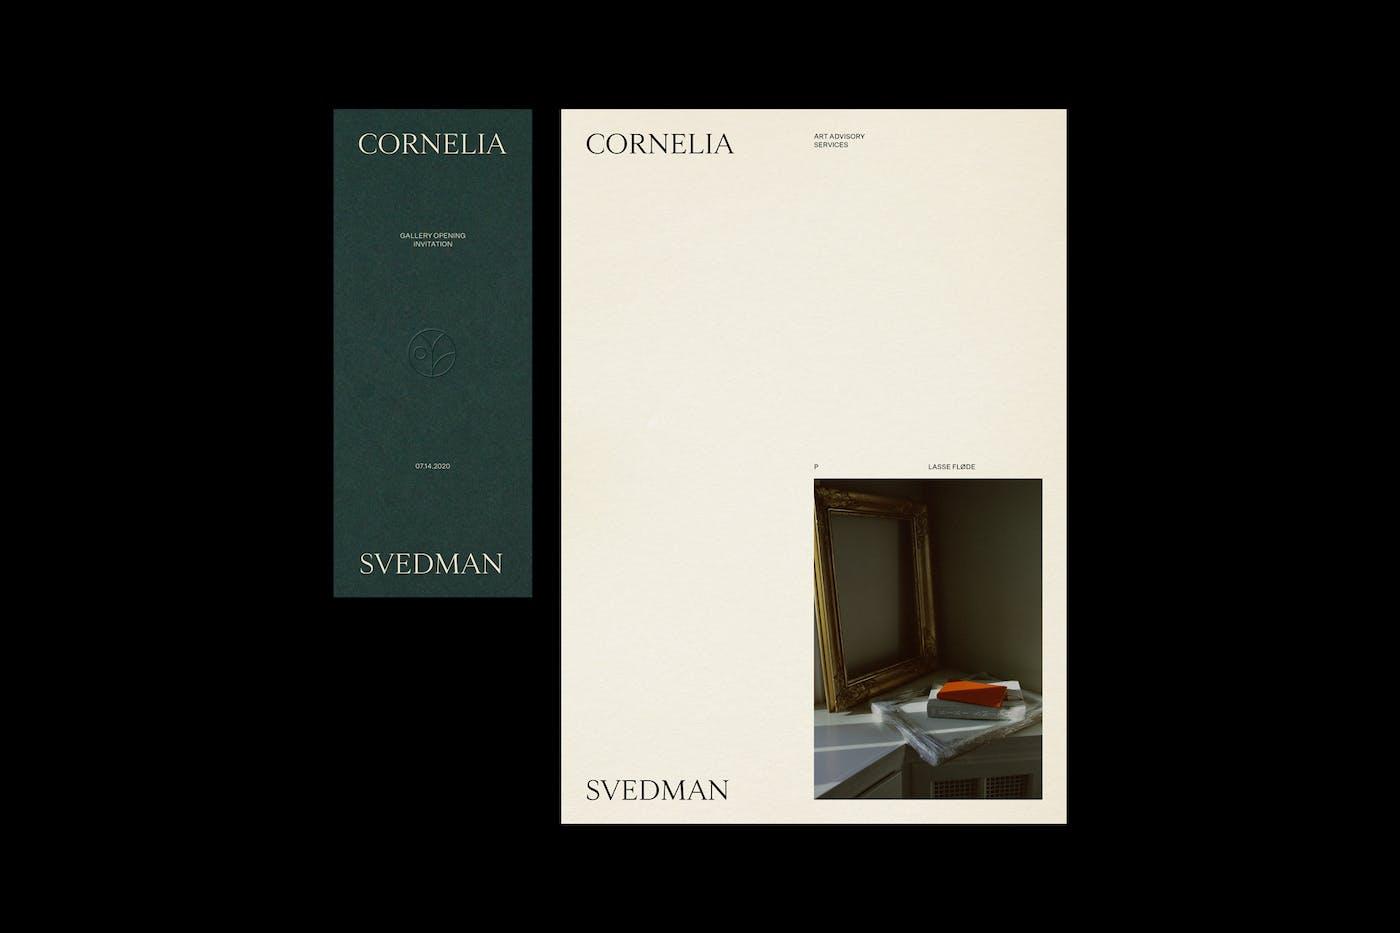 Cornelia Svedman Invitation Photo Letter